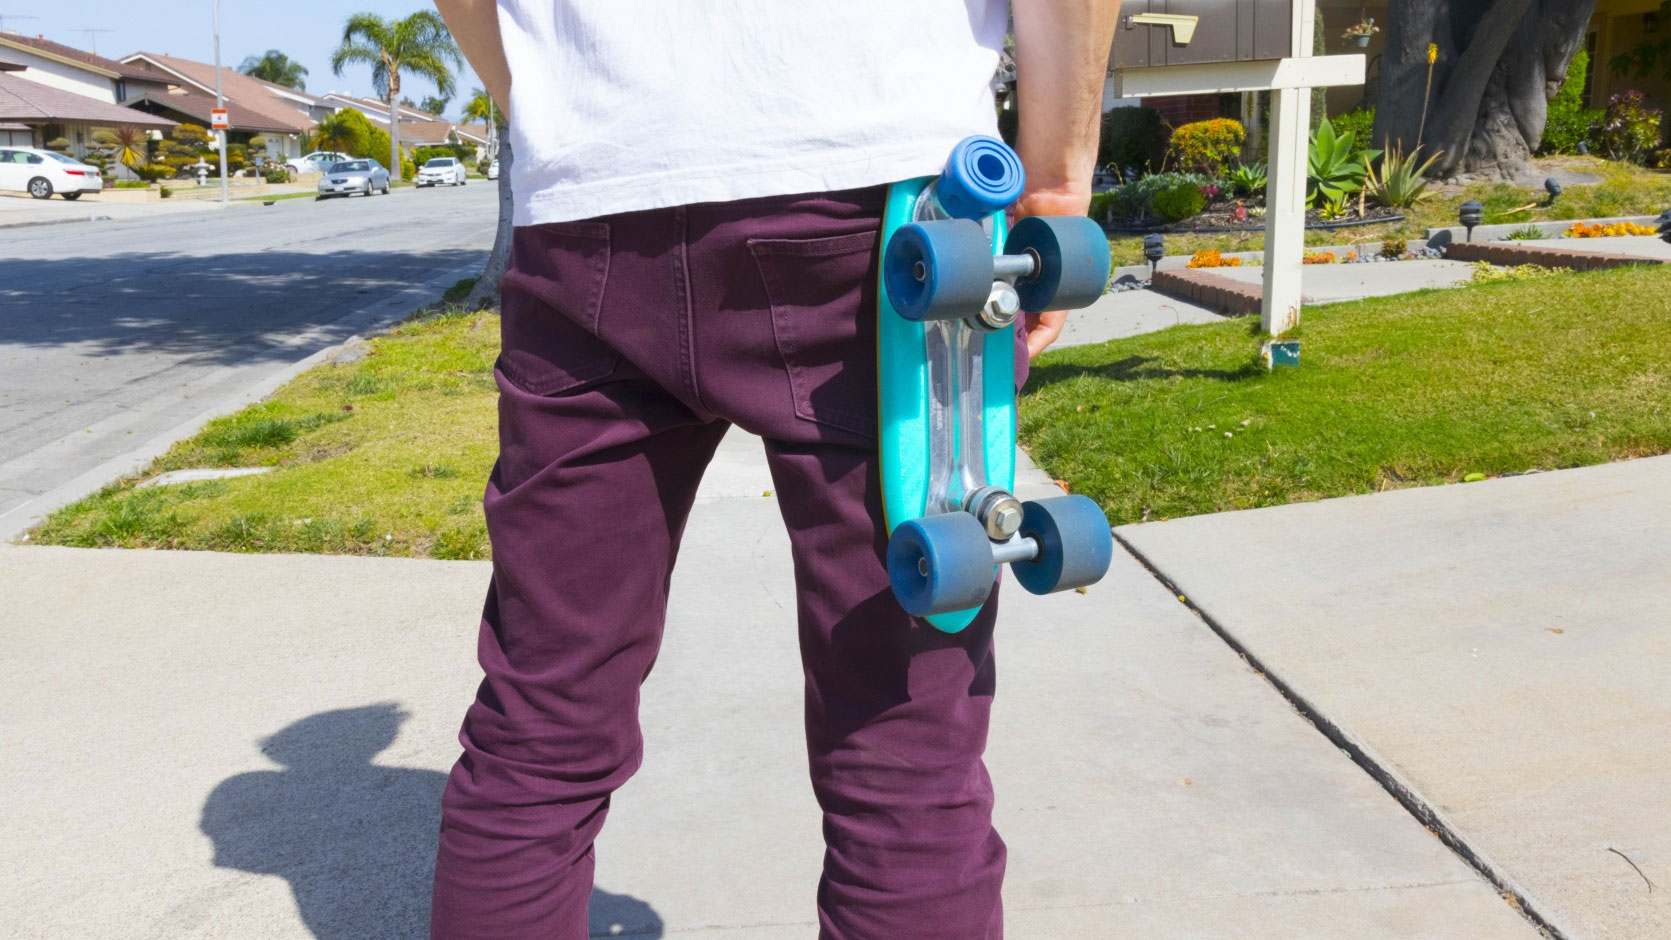 3d-printed-half-penny-skateboard-00